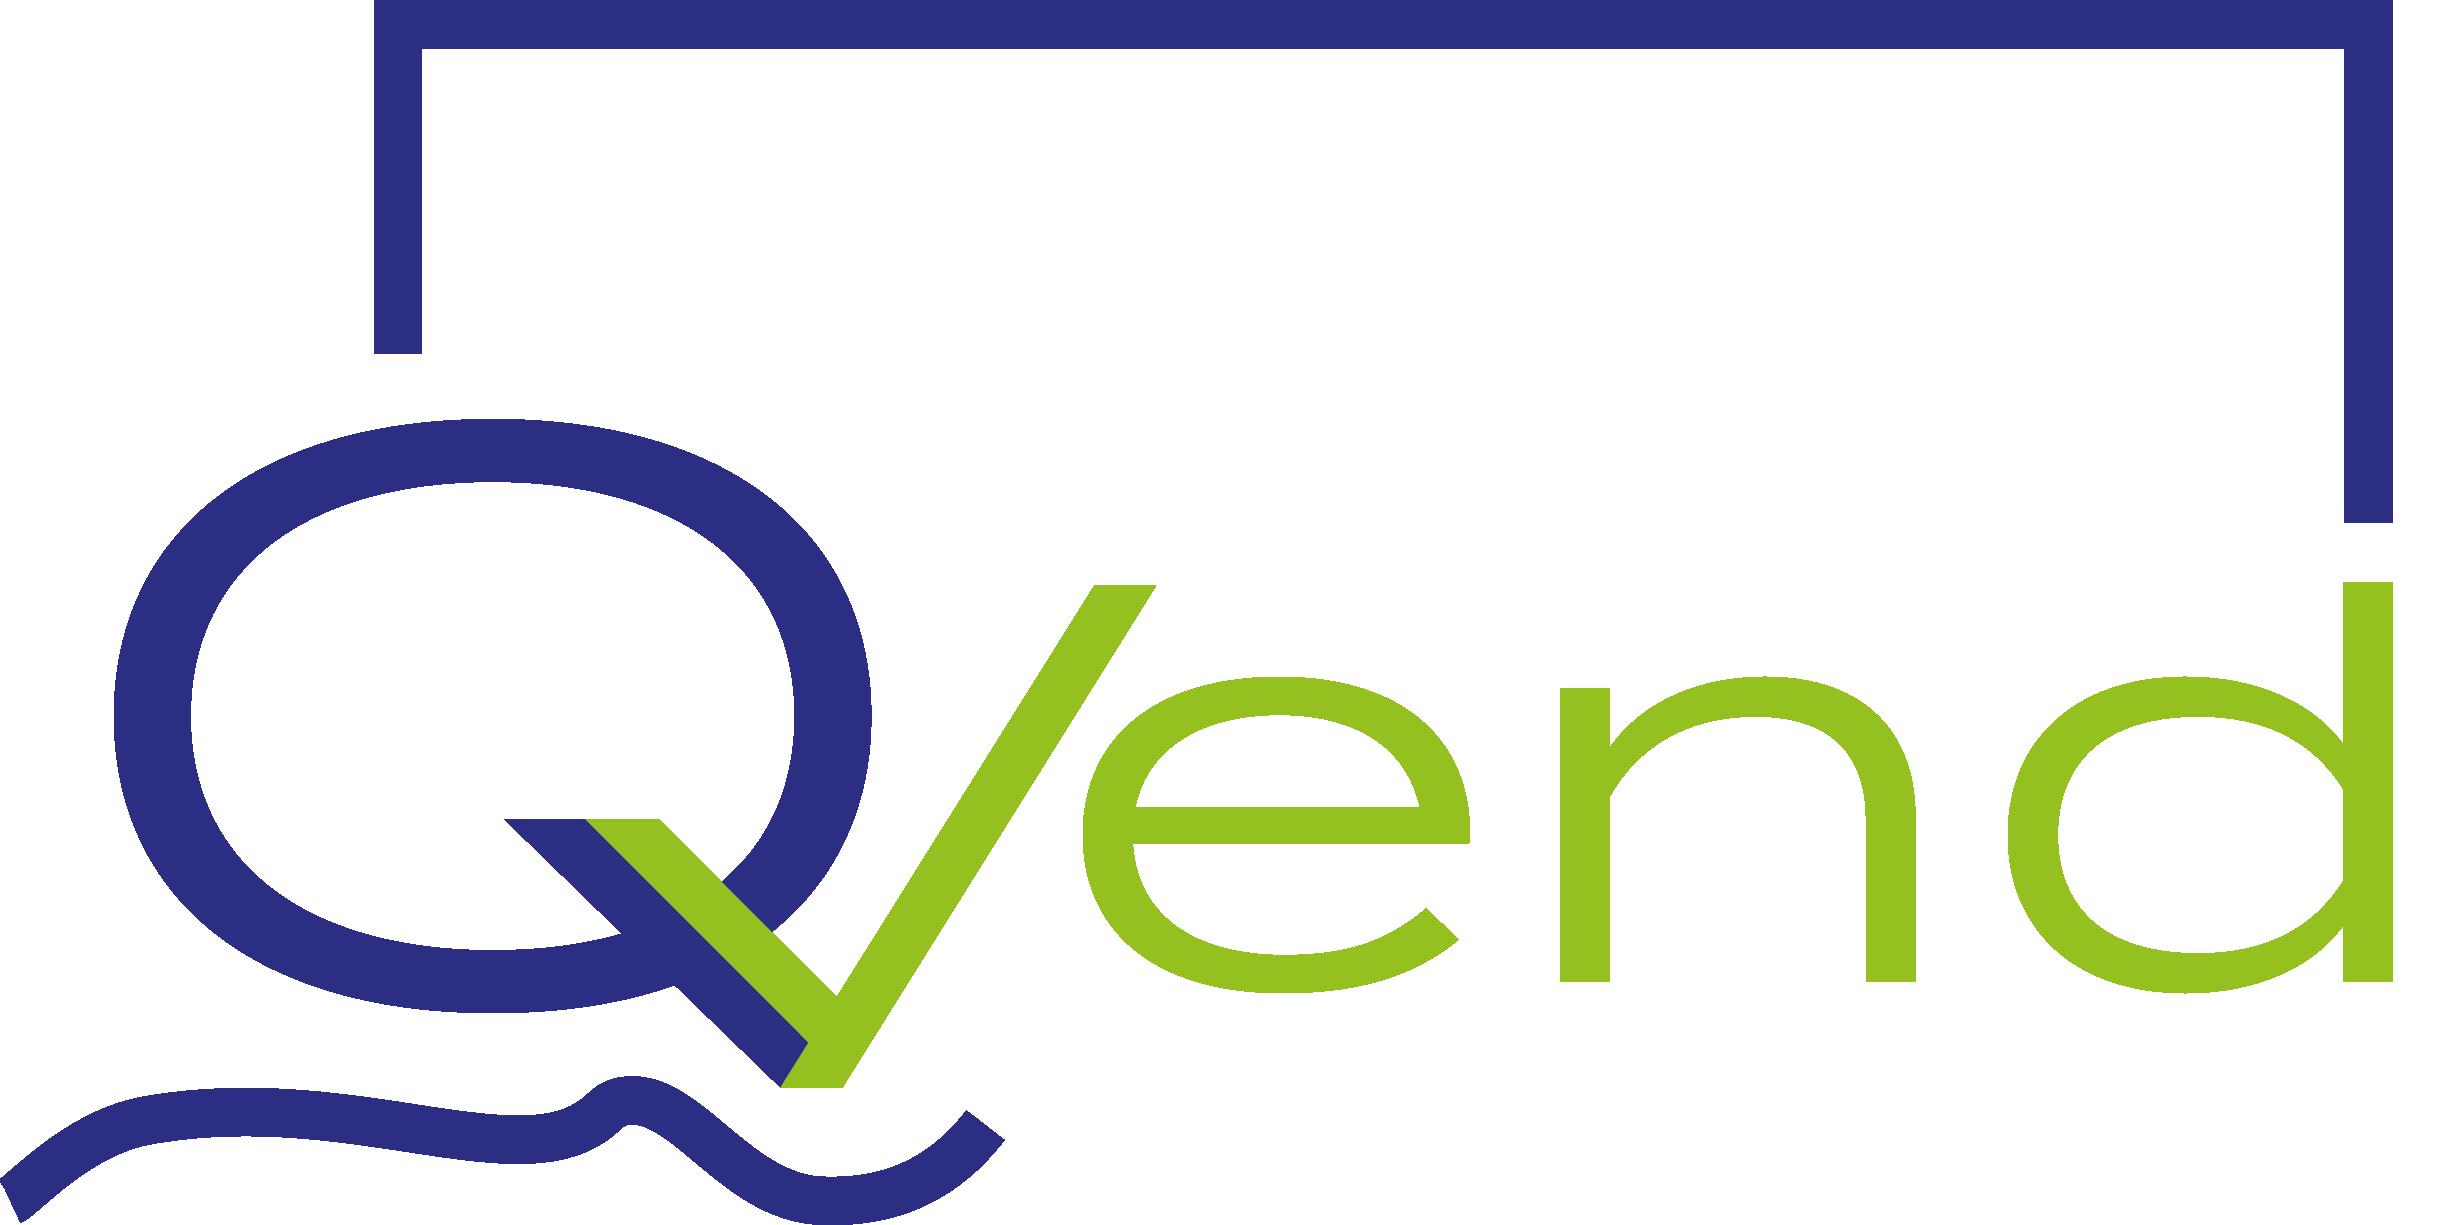 Q-vend Logo